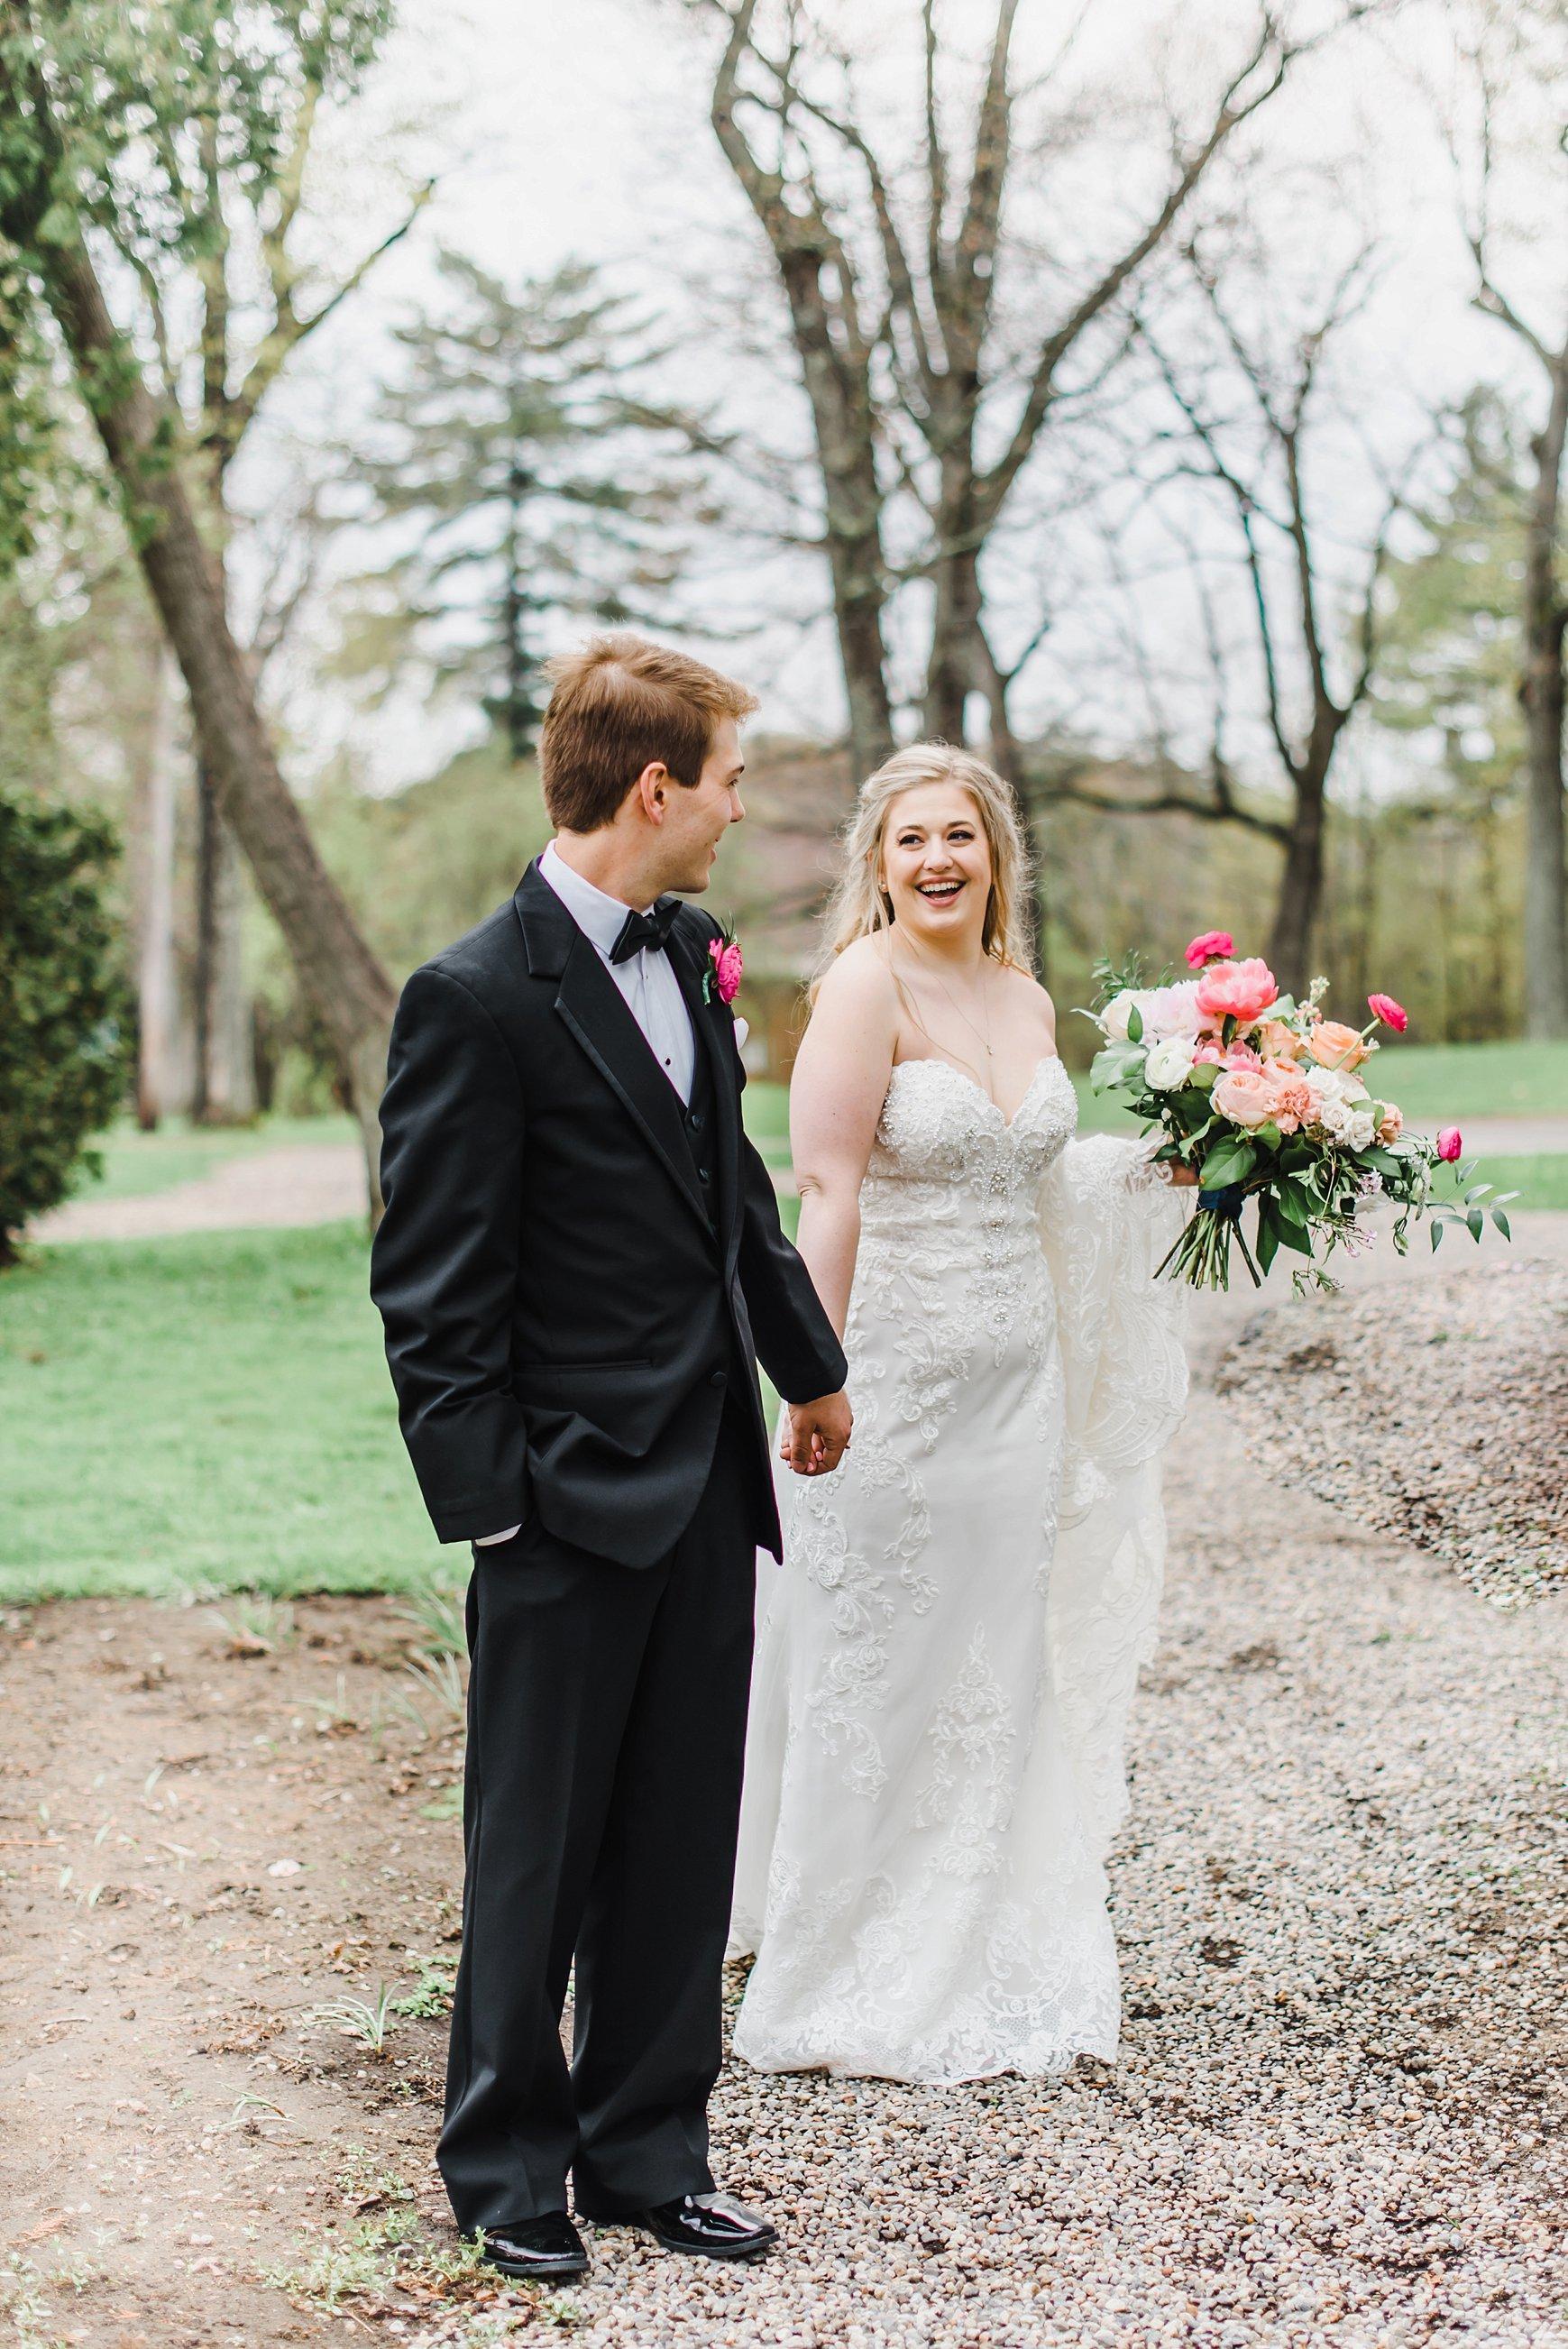 light airy indie fine art ottawa wedding photographer | Ali and Batoul Photography_0194.jpg